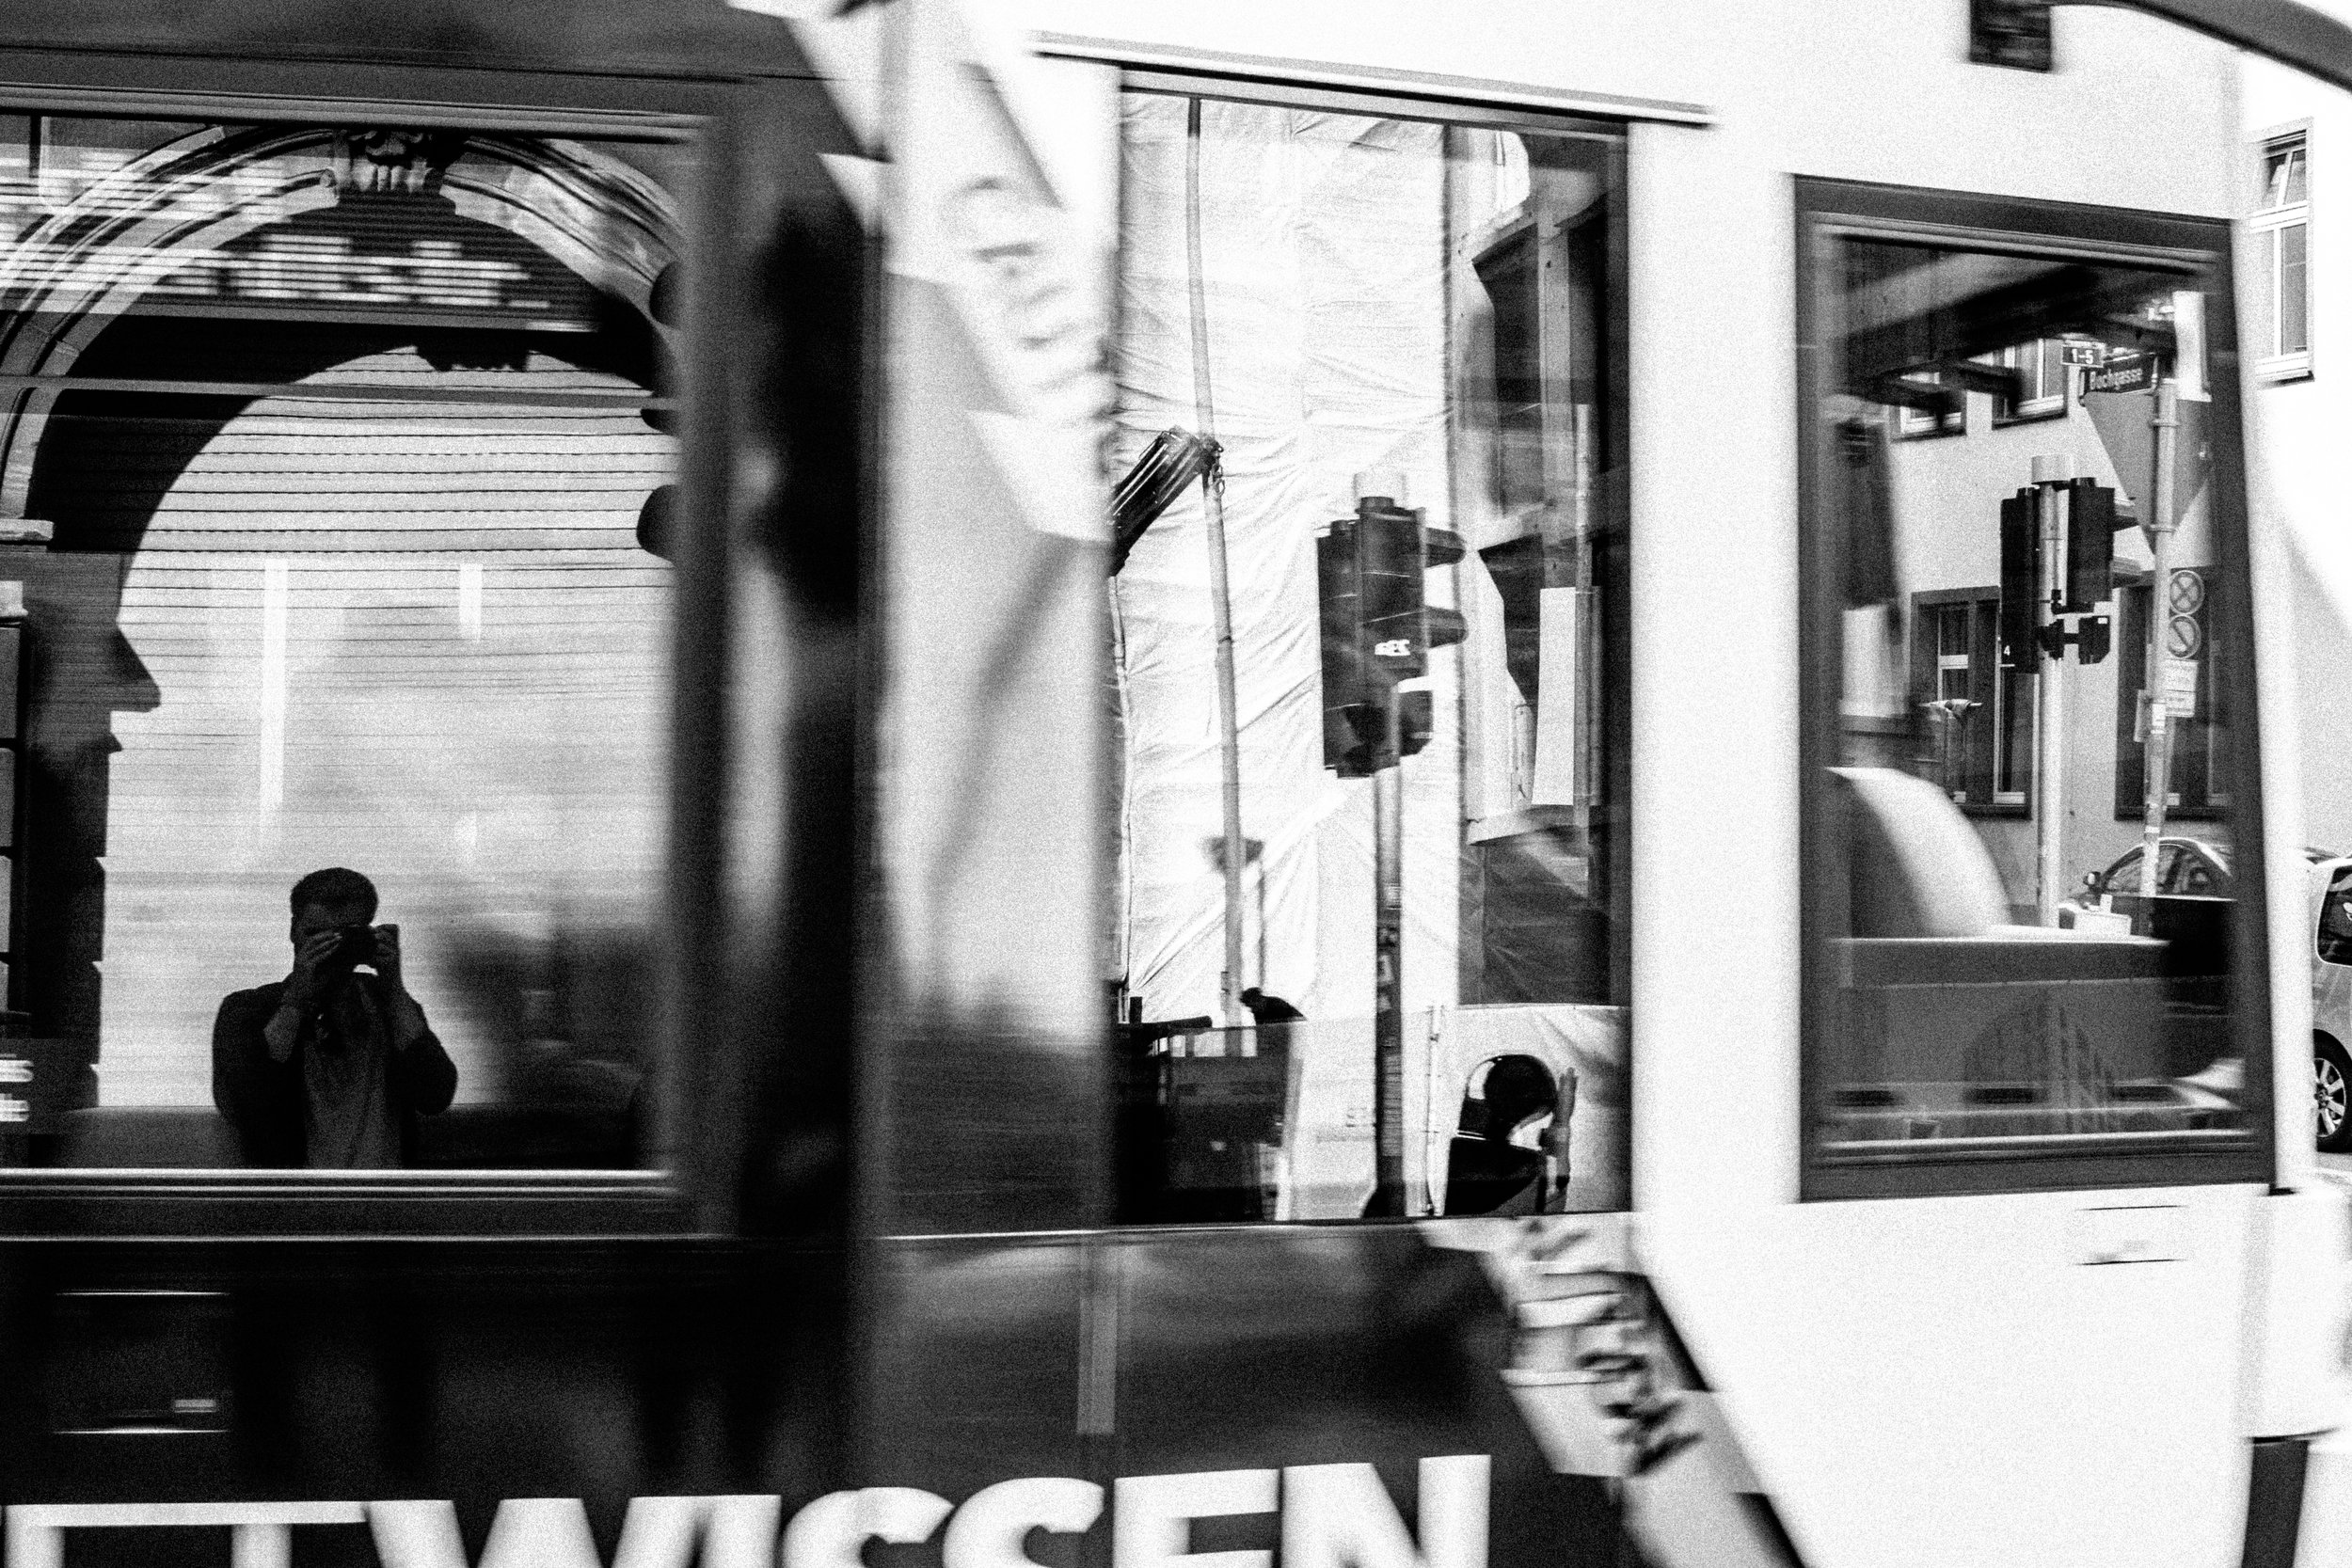 TRAM REFLECTIONS, FRANKFURT